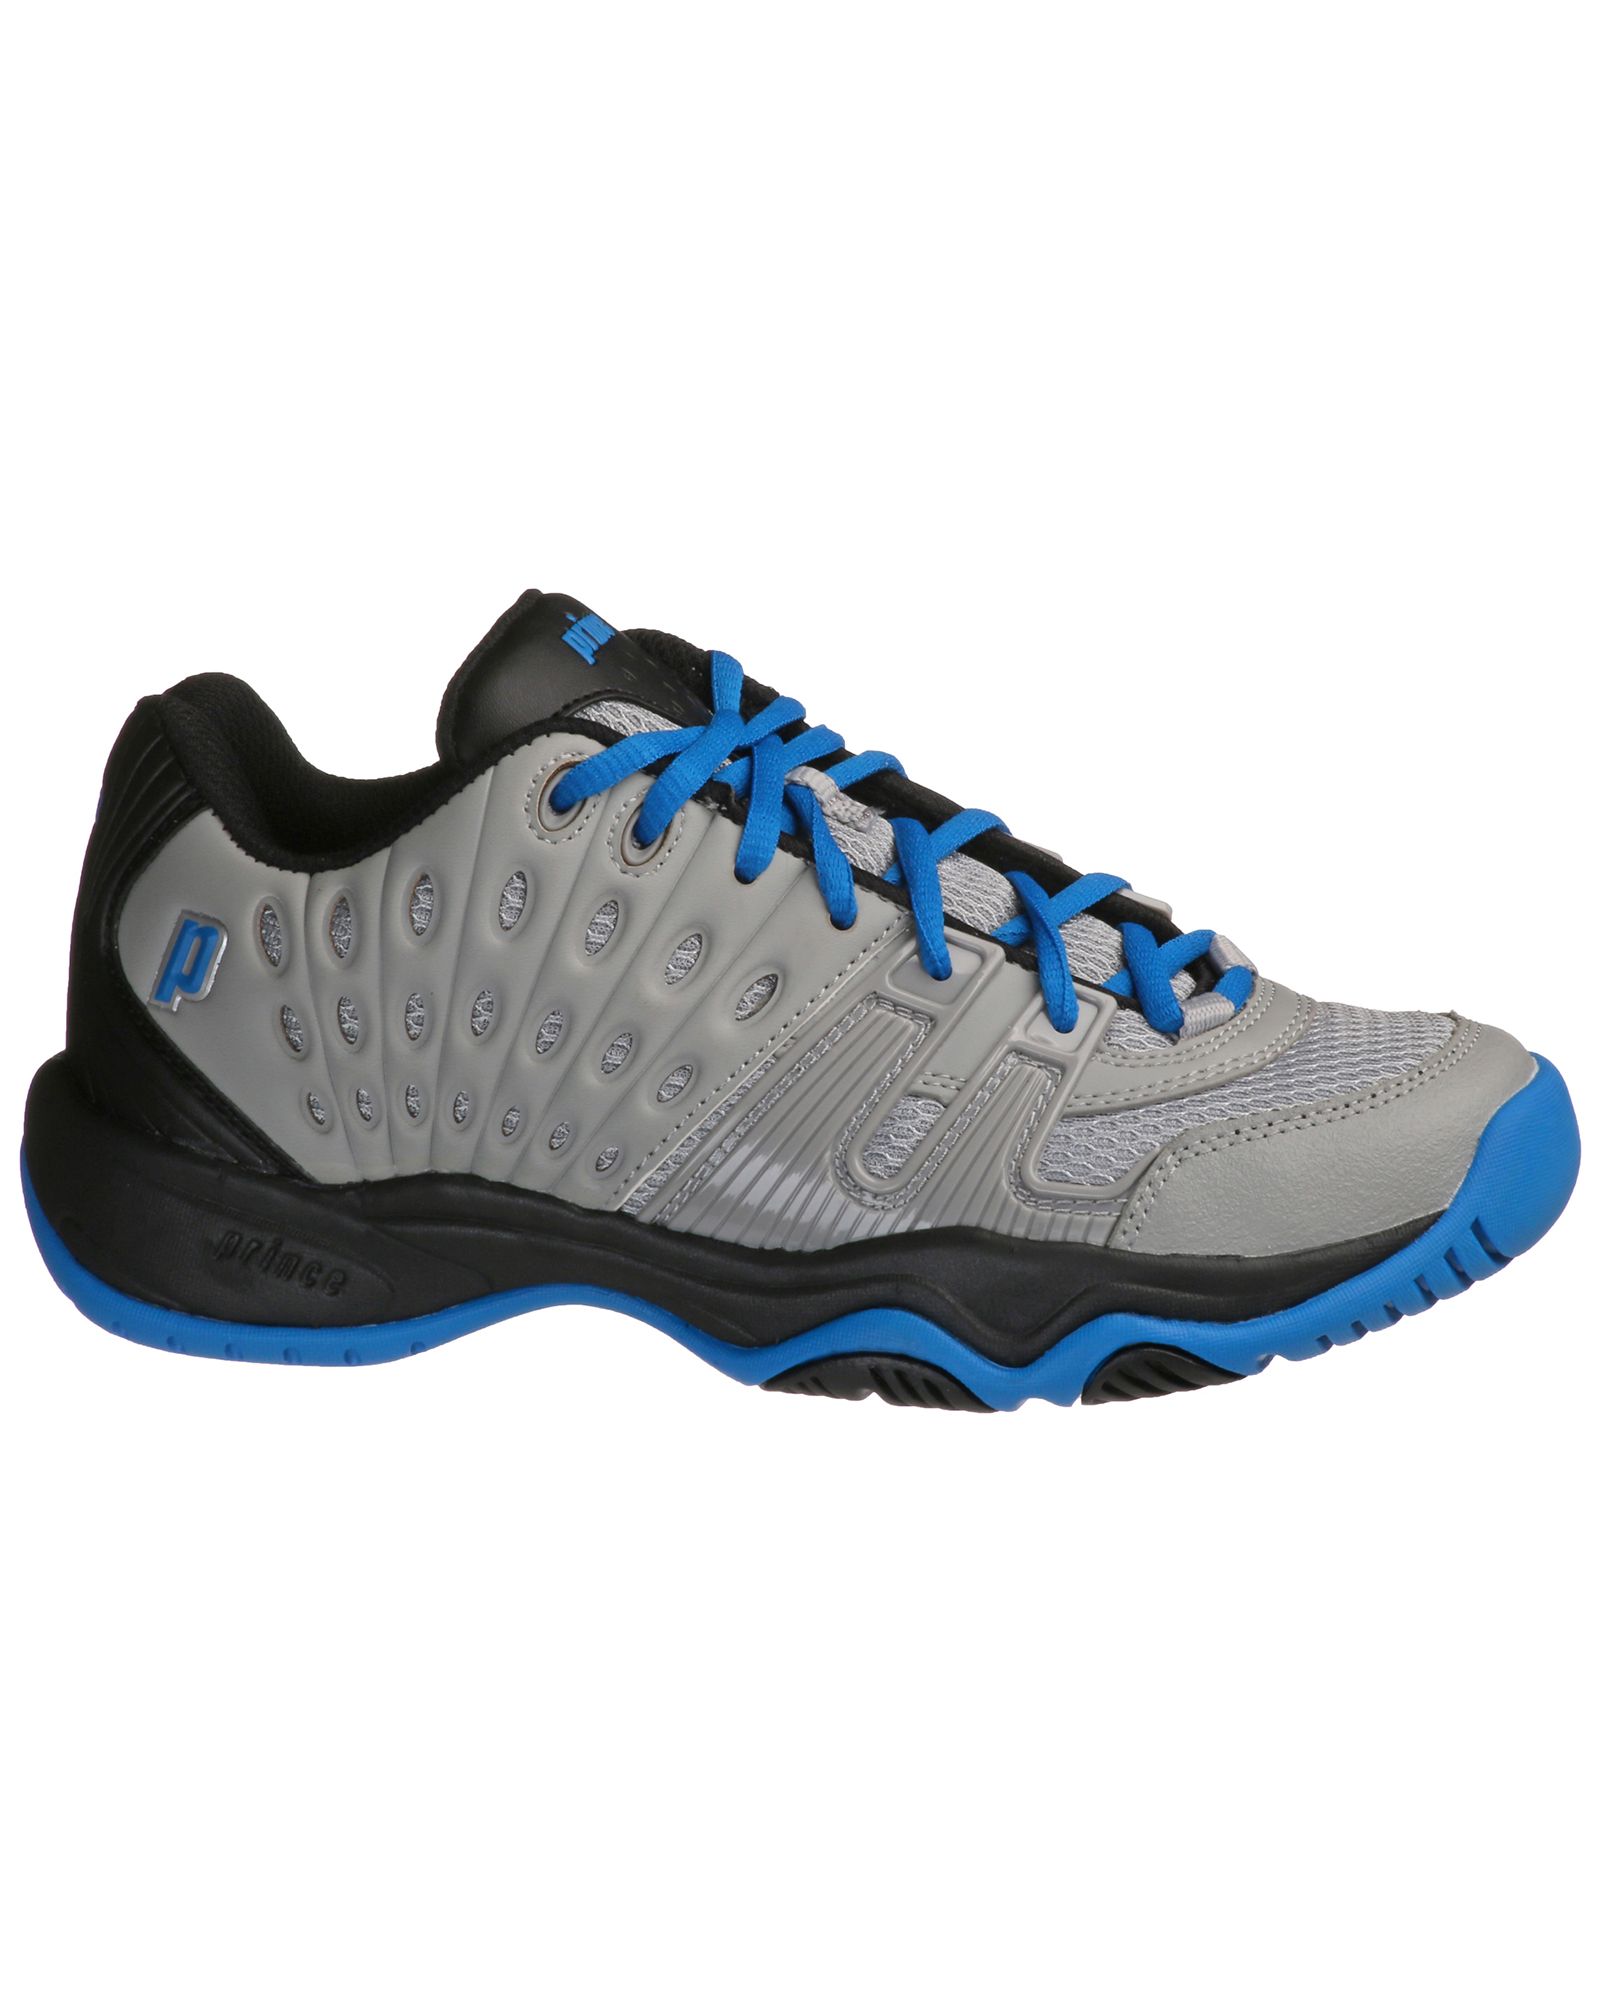 ae63e408c1afe8 Prince Junior T22 Grey Royal Black Tennis Shoe – SGS